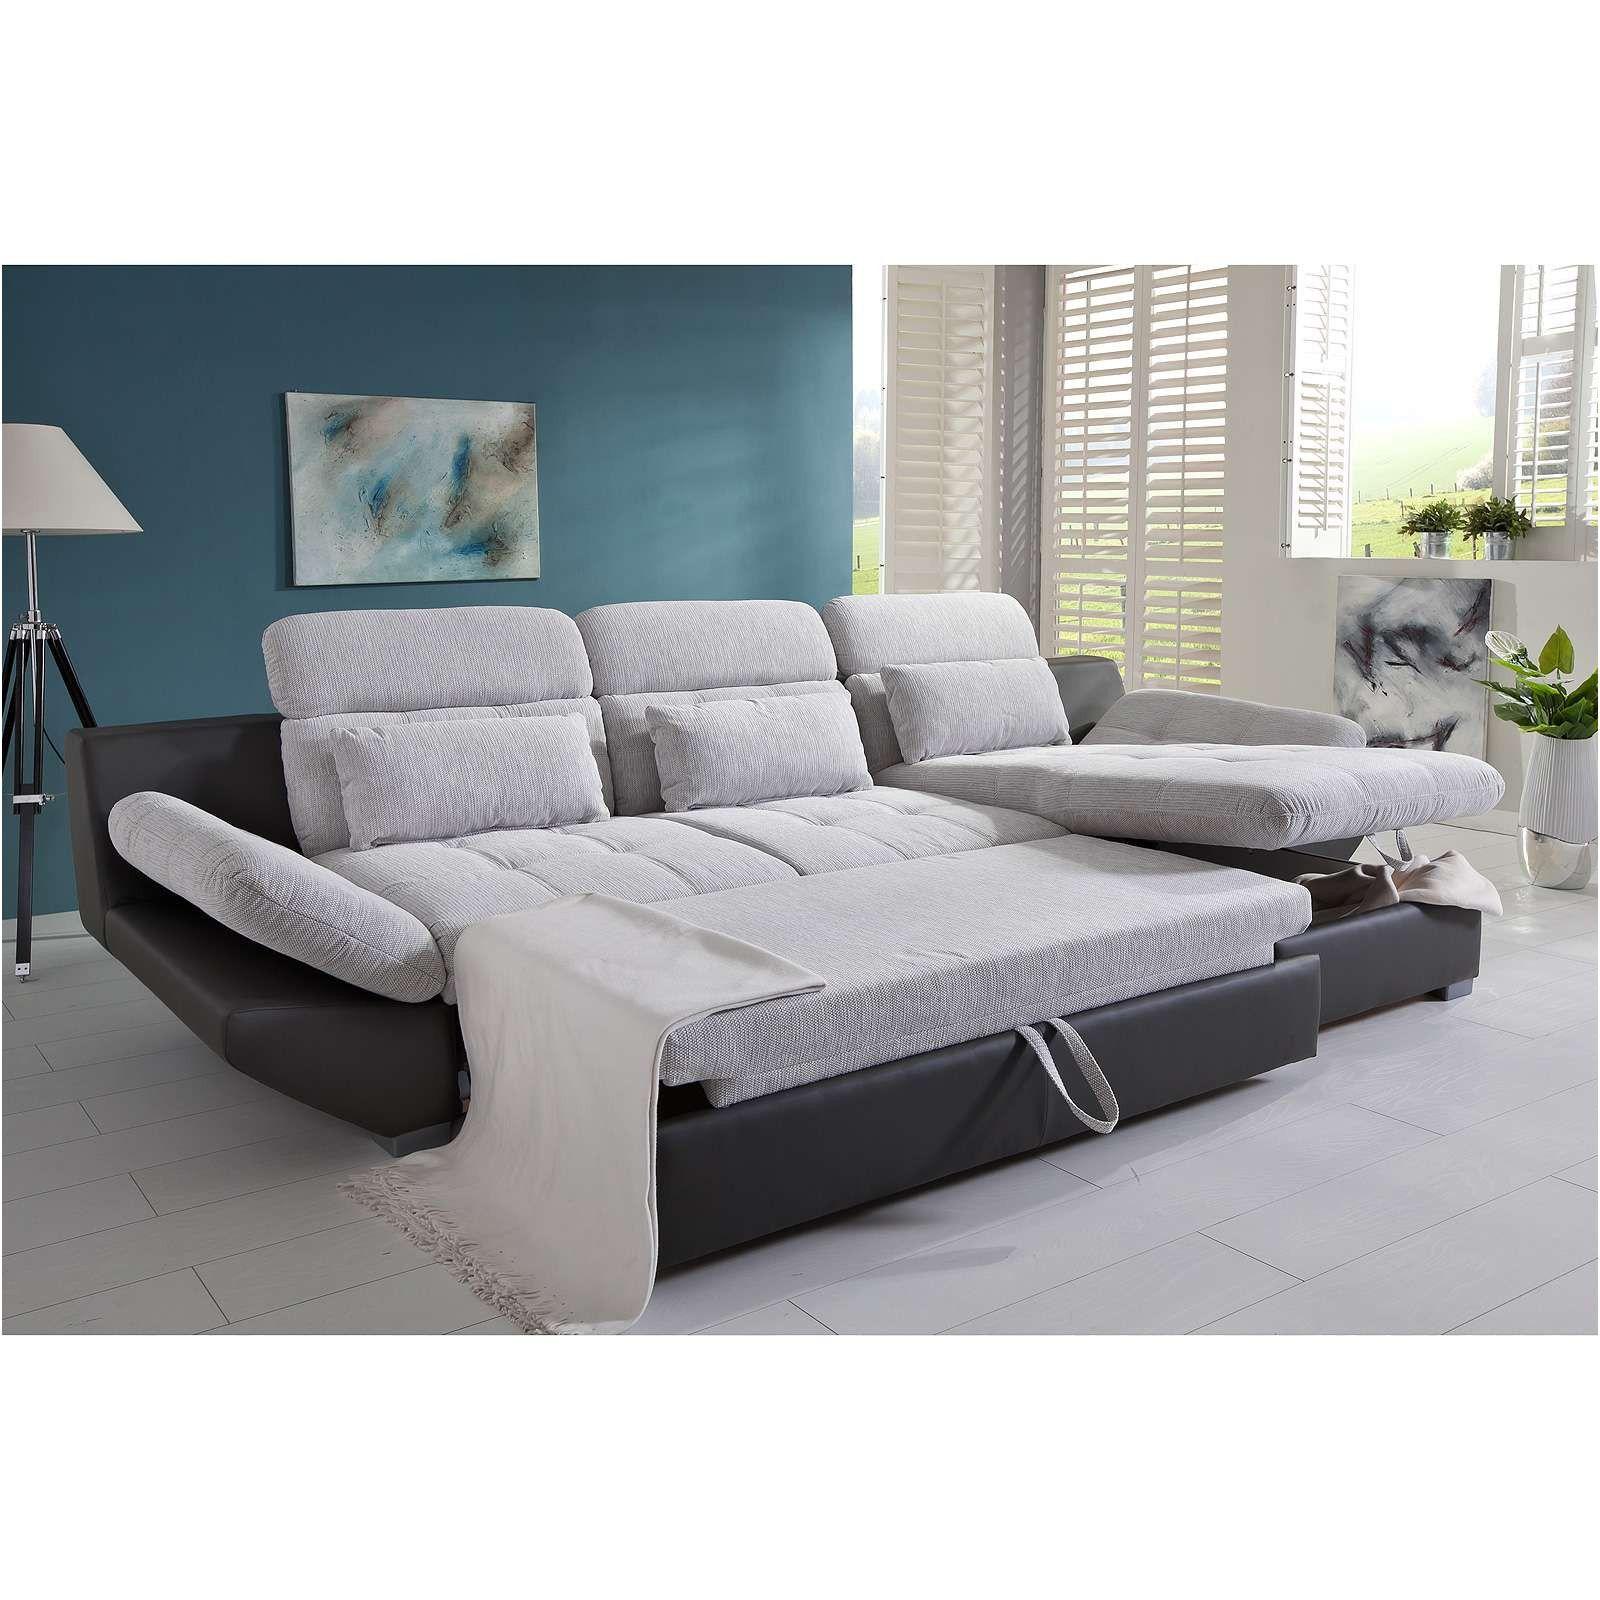 Ideal Otto Versand Möbel sofa